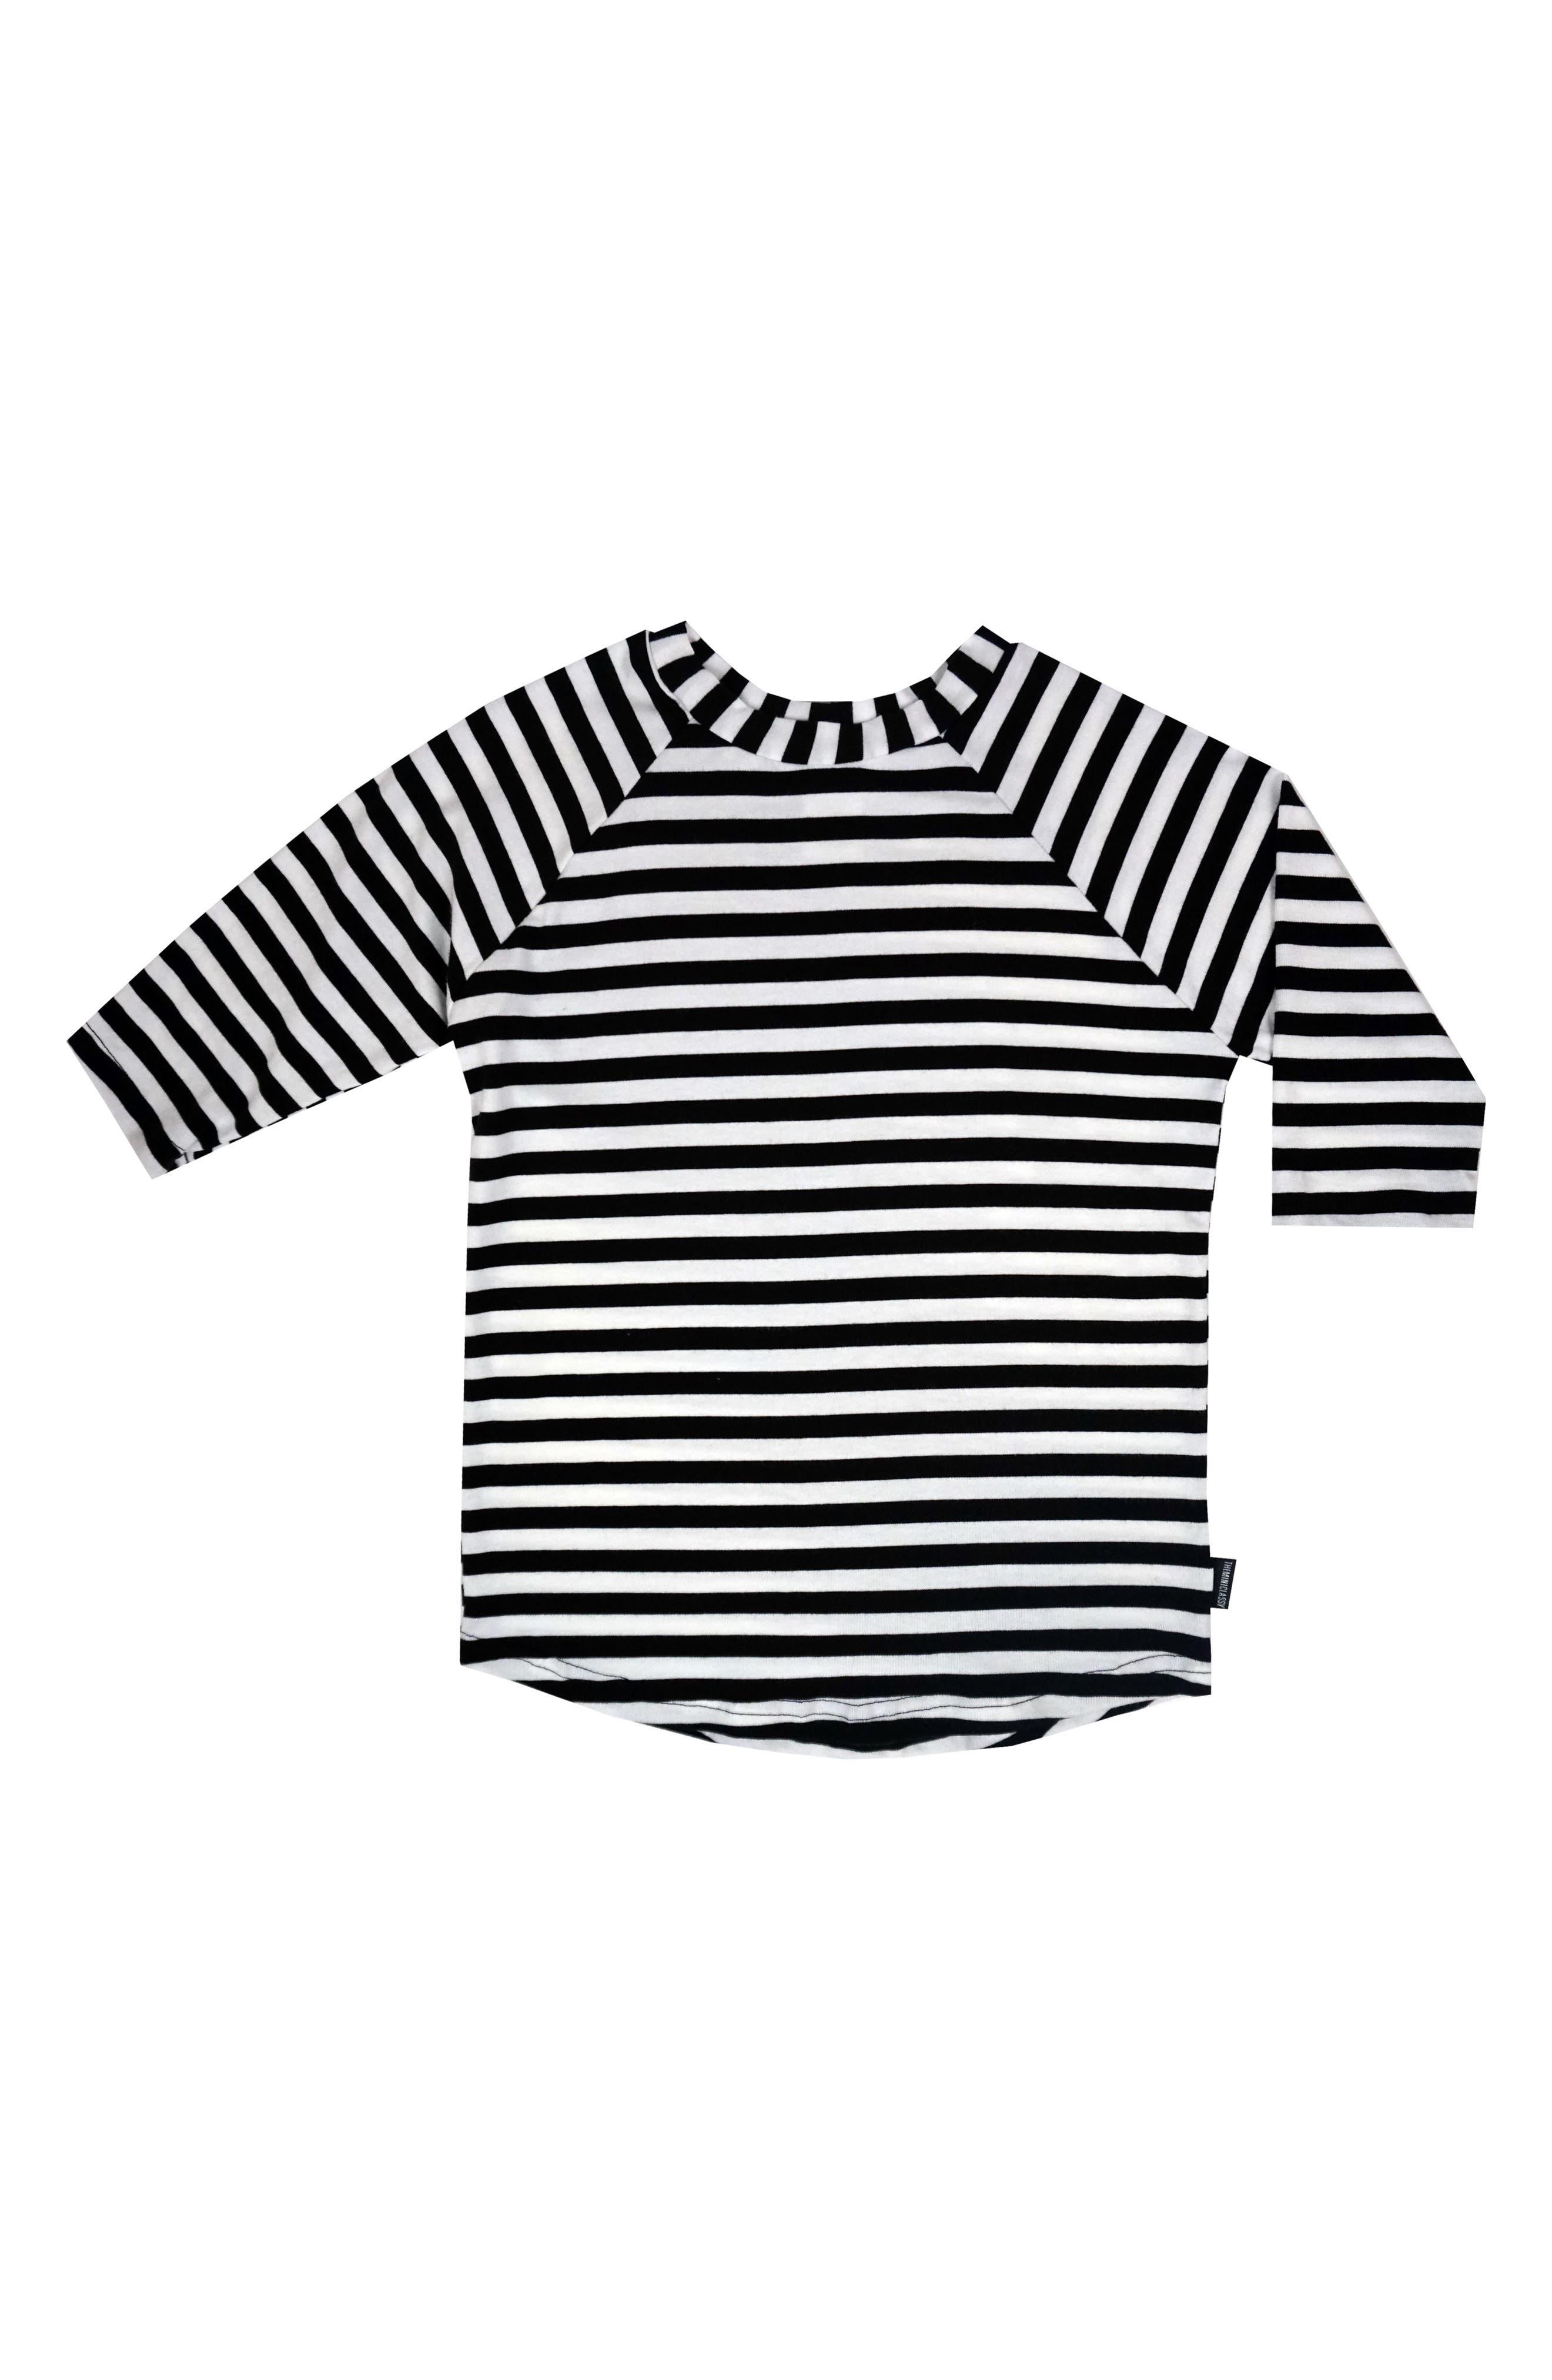 Alternate Image 1 Selected - THEMINICLASSY Raglan Sleeve T-Shirt (Toddler Boys & Little Boys)